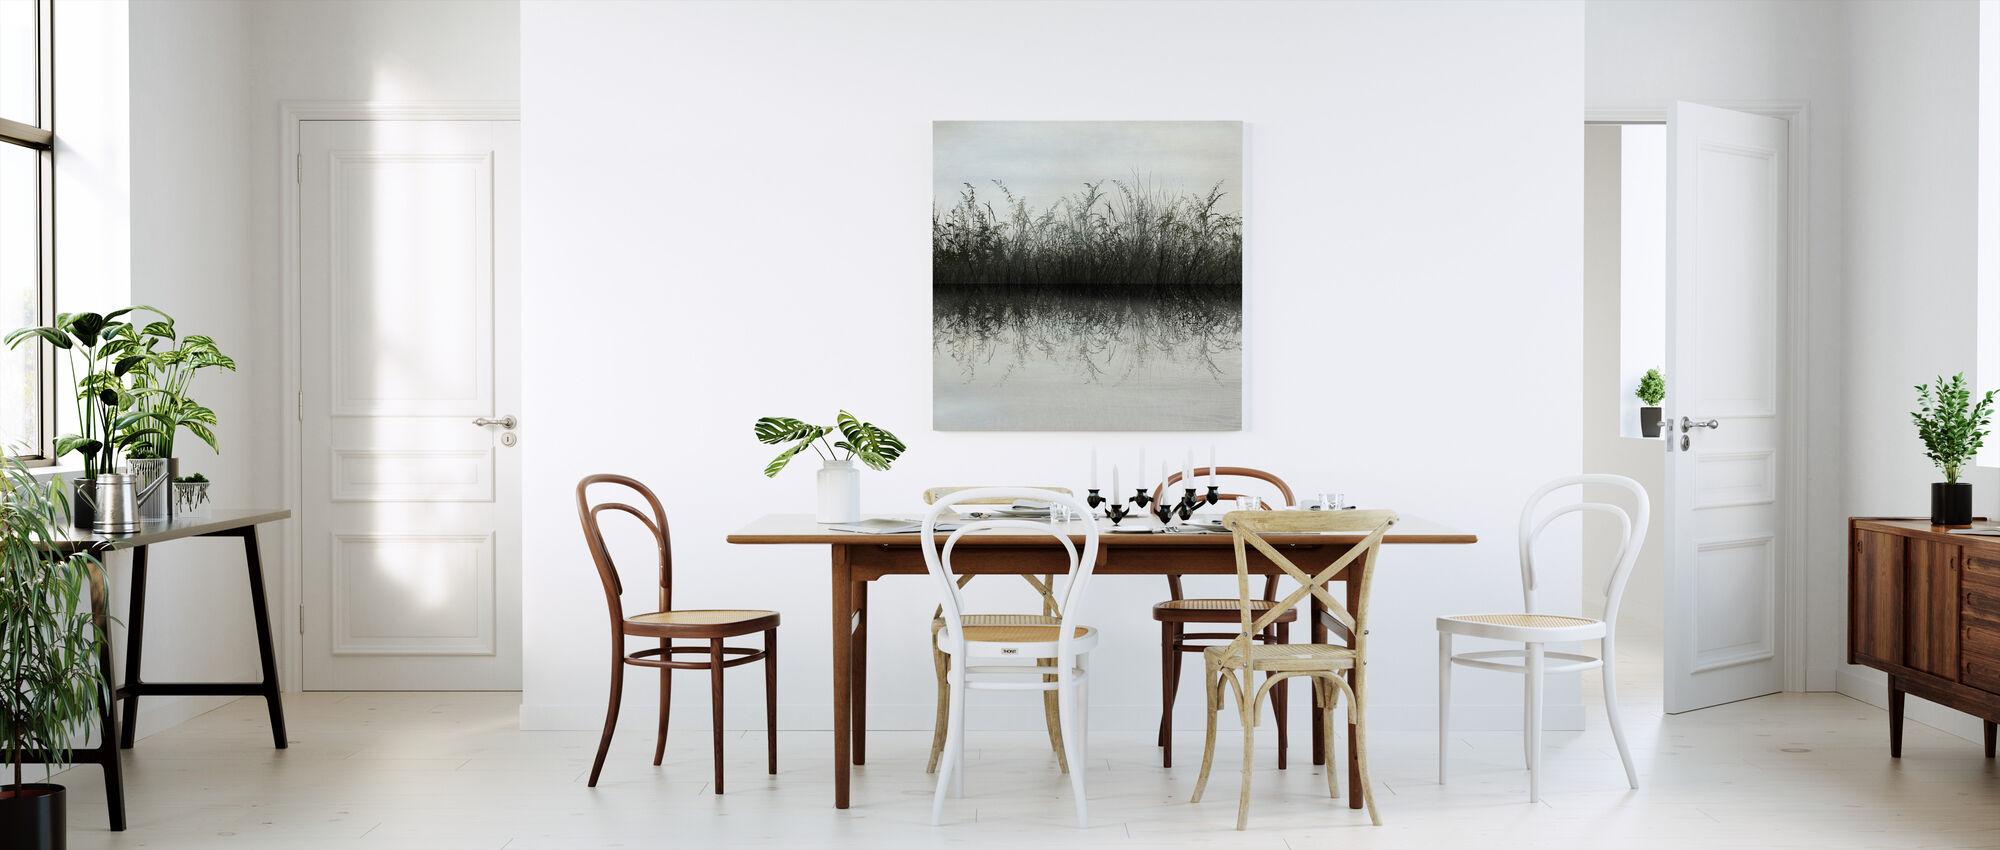 Ruoho Veden heijastus - Canvastaulu - Keittiö